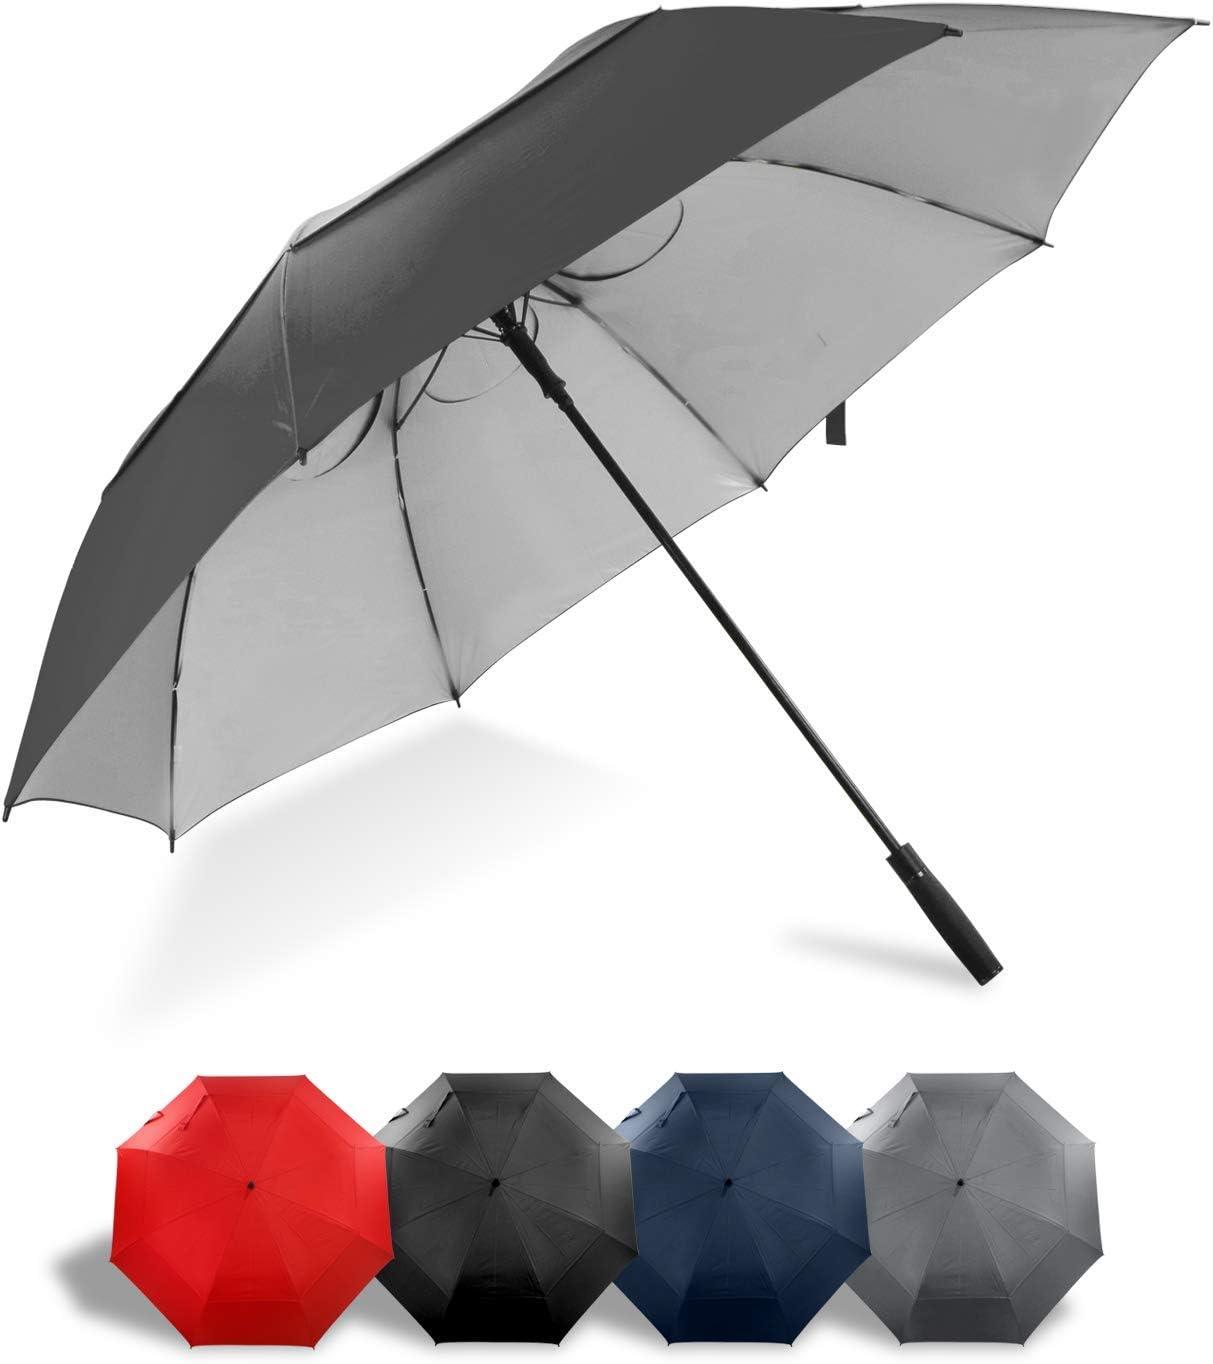 Lejorain 68 inch Large 新品未使用正規品 ファクトリーアウトレット Windproof Oversi Auto Golf Umbrella- Open